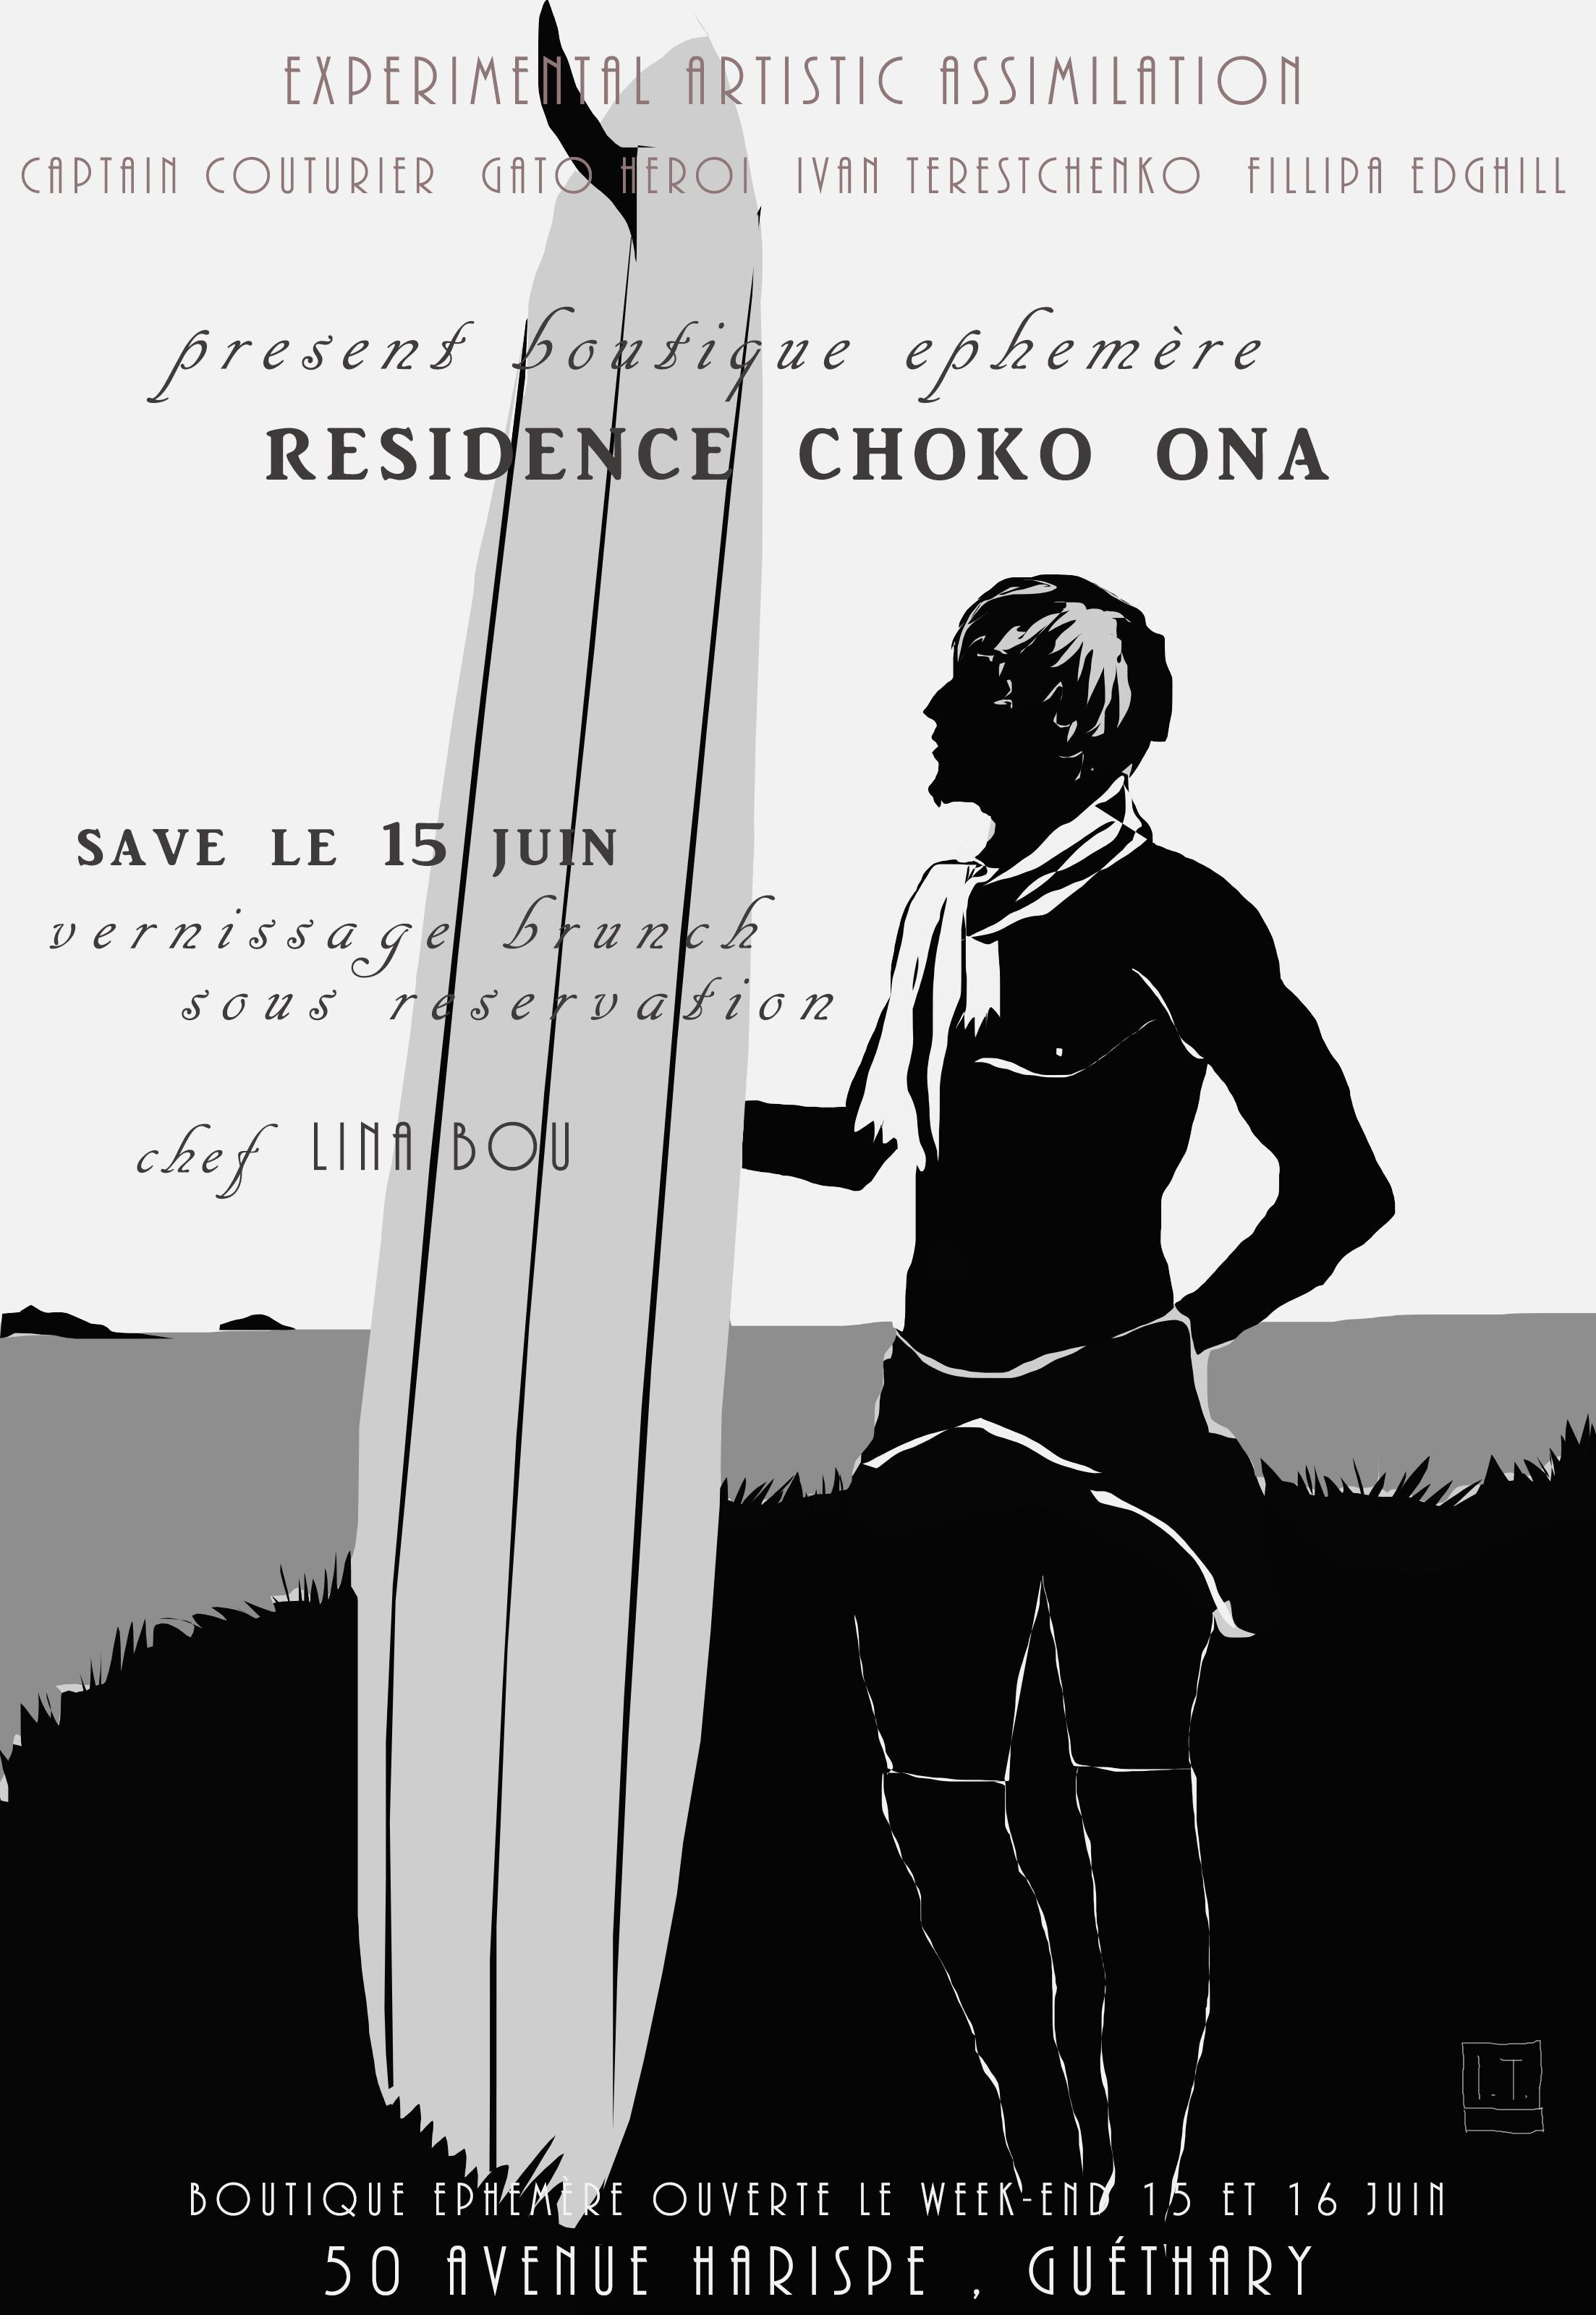 POSTER CHOKO ONA 2.jpg